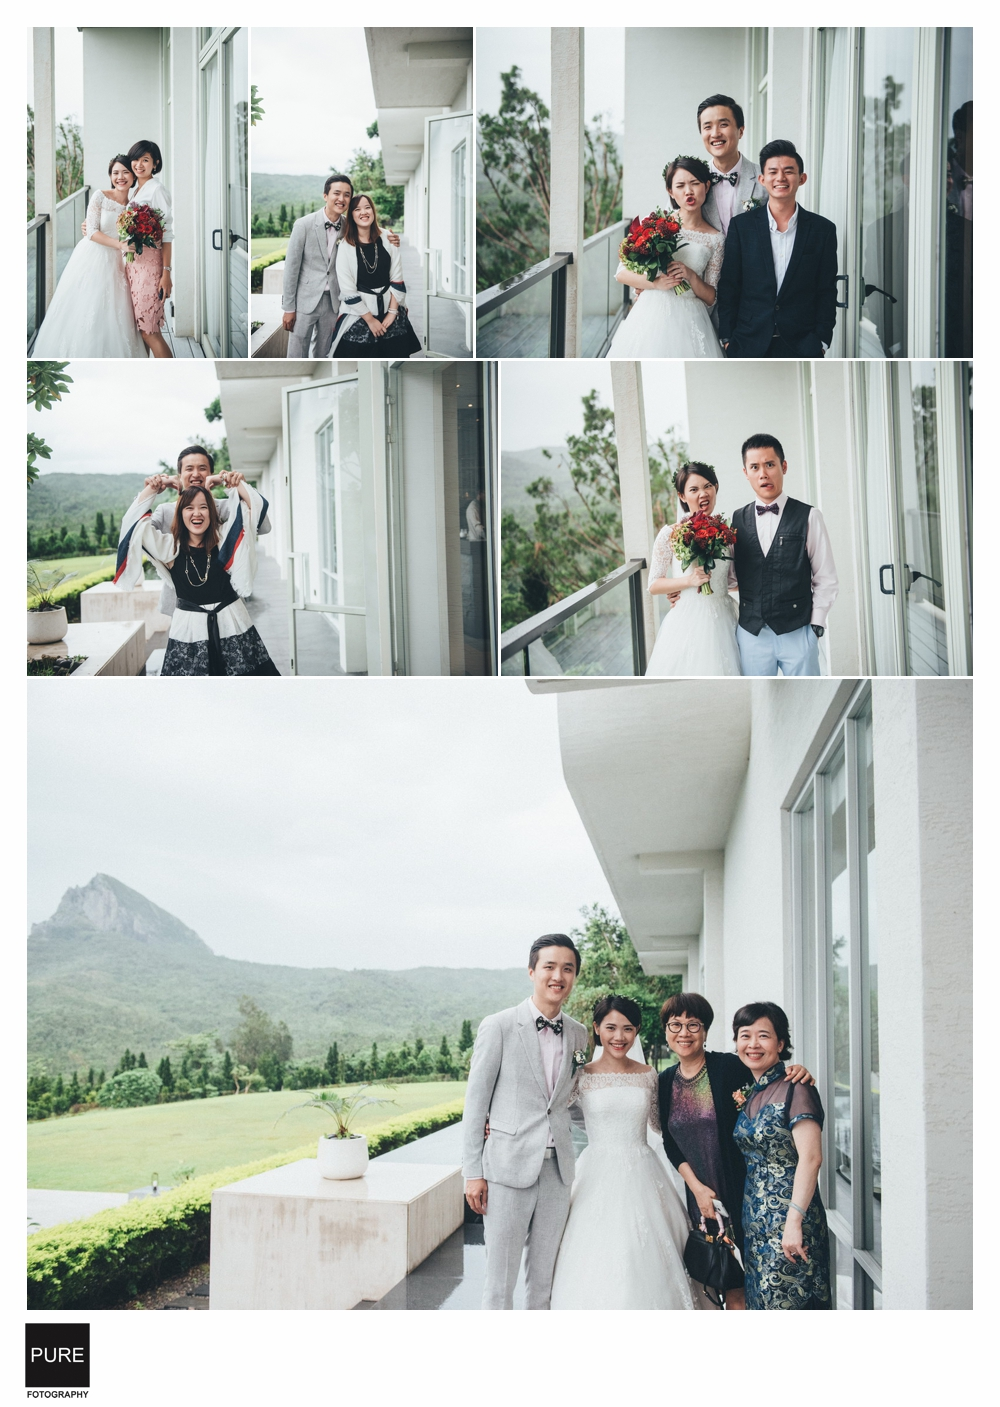 PUREFOTO_台灣婚禮平面攝影wedding_PURE婚紗婚禮攝影